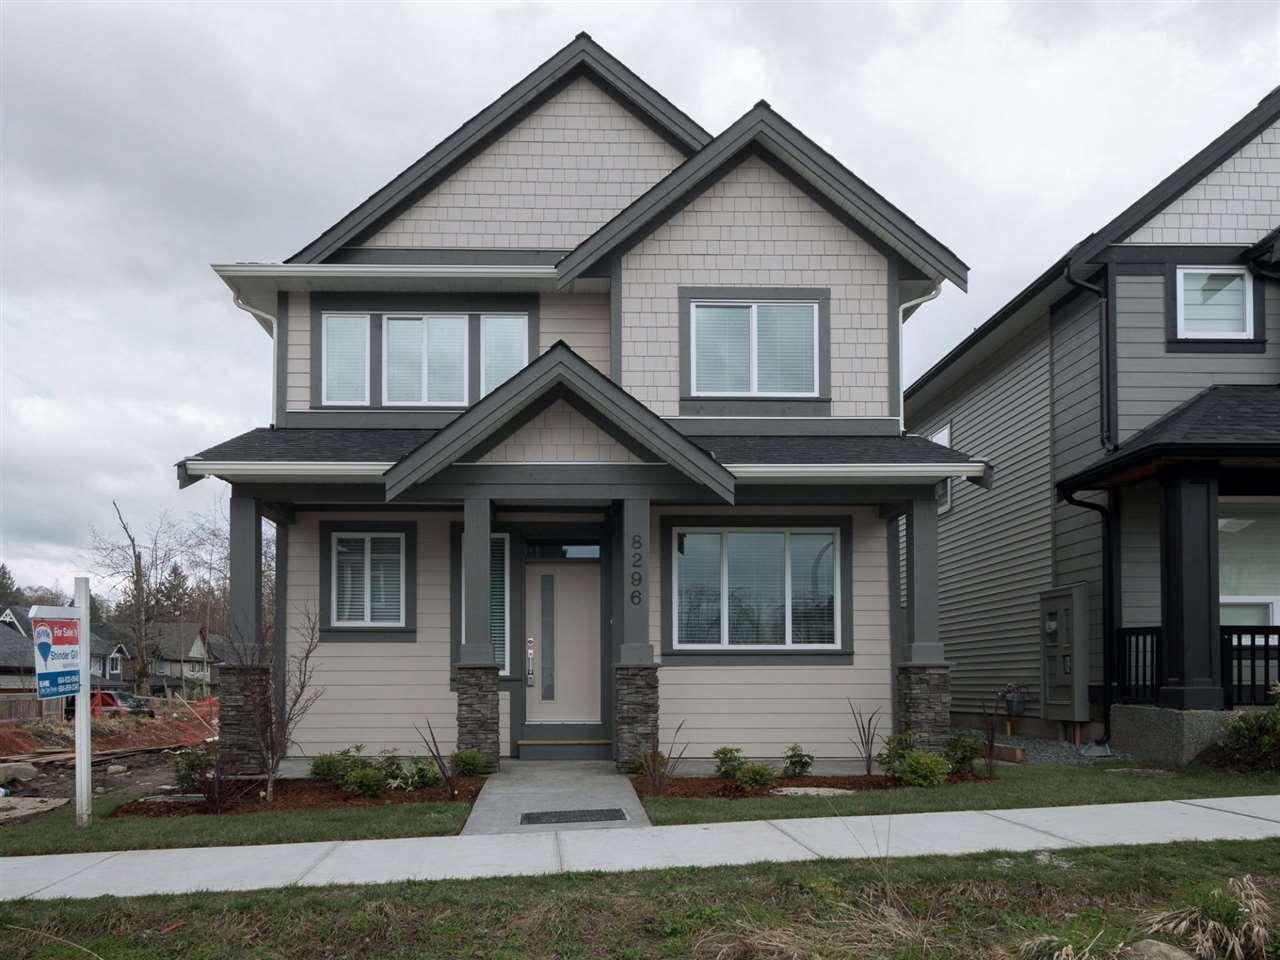 8296 204 STREET, Langley, BC, V2Y 0S3 Photo 1